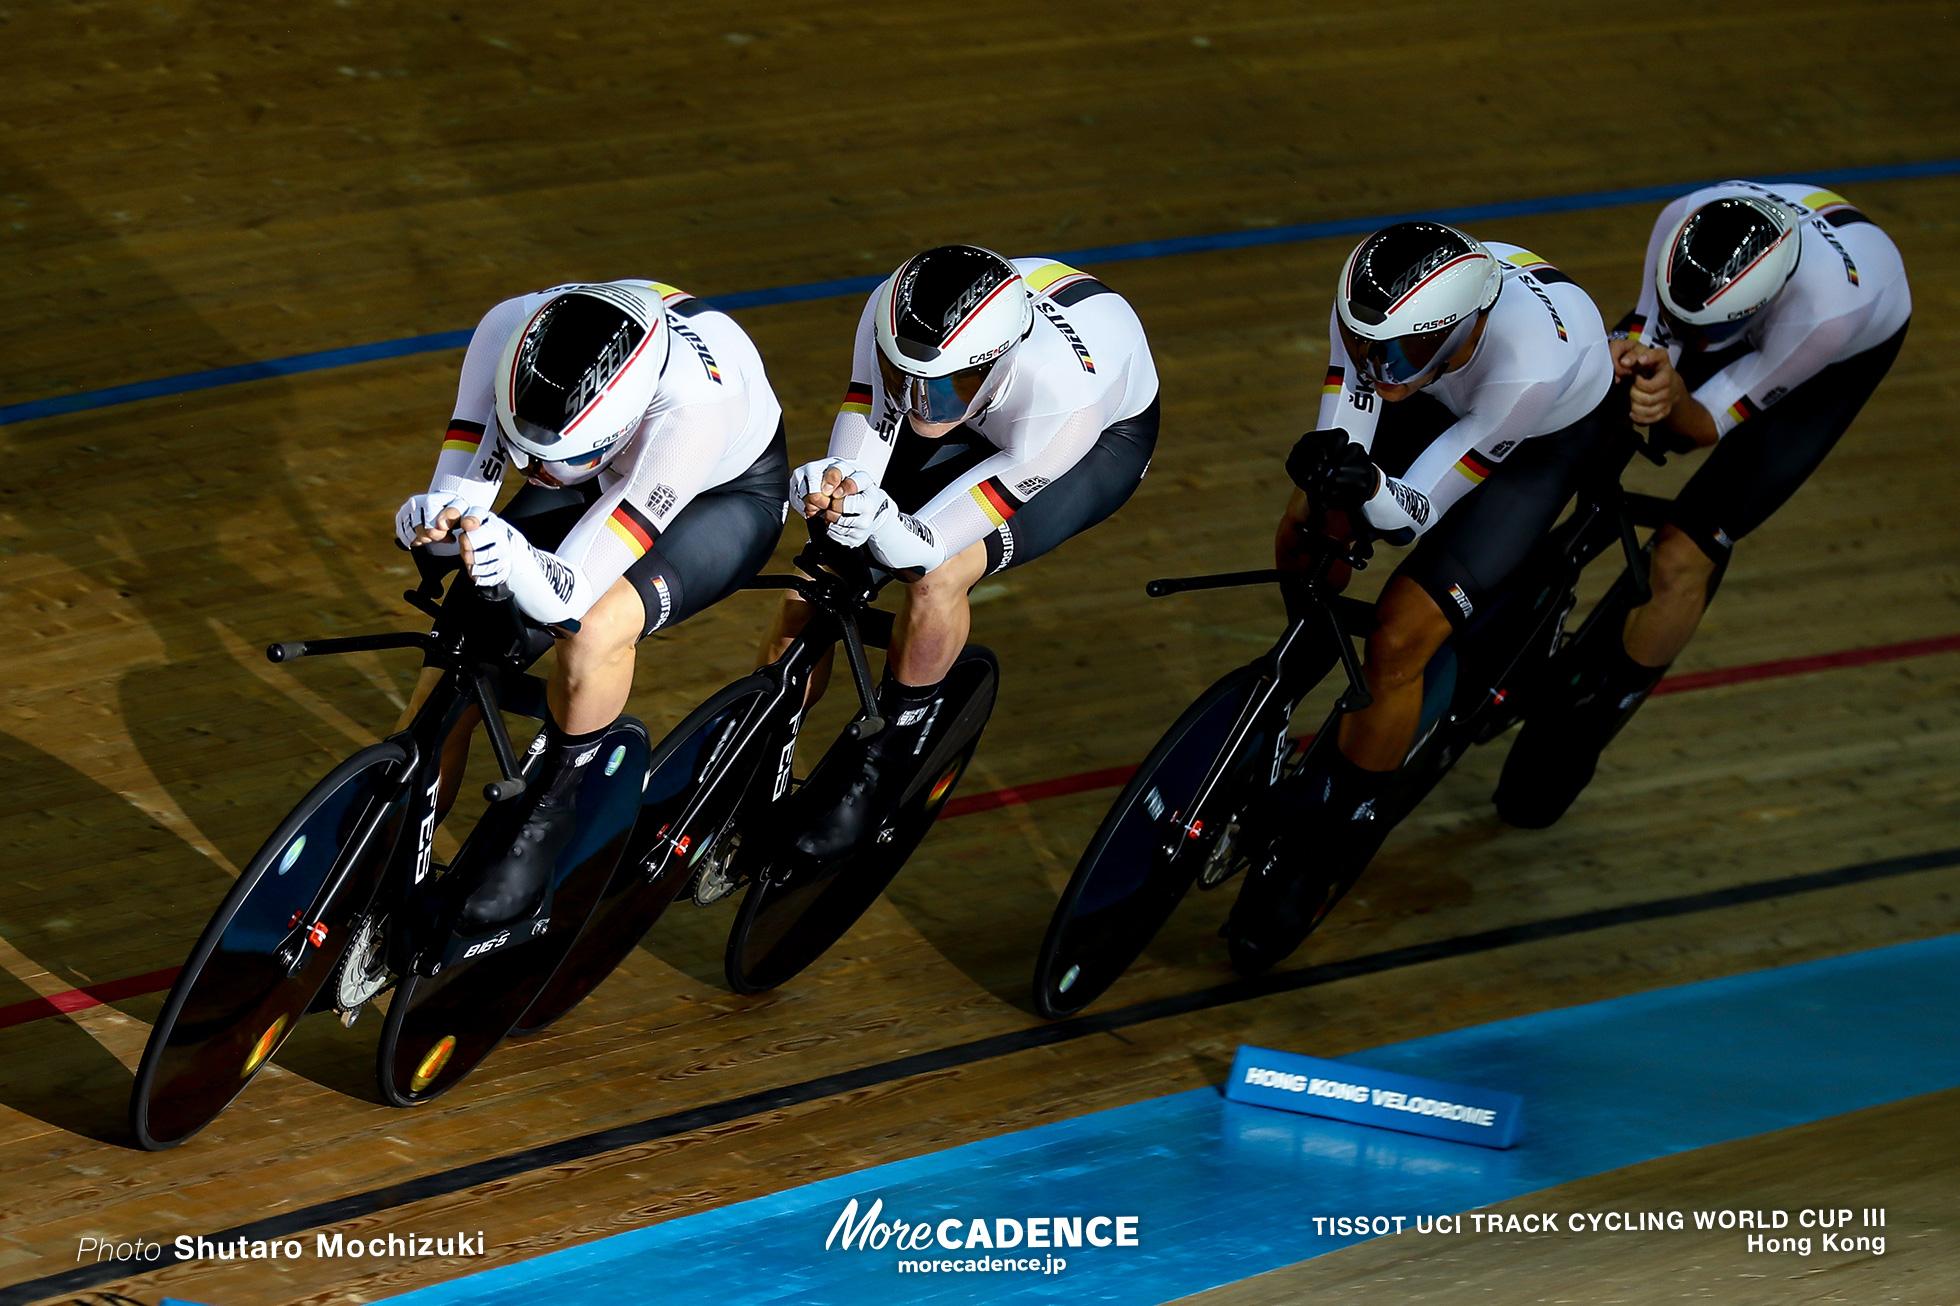 Final / Men's Team Pursuit / TISSOT UCI TRACK CYCLING WORLD CUP III, Hong Kong